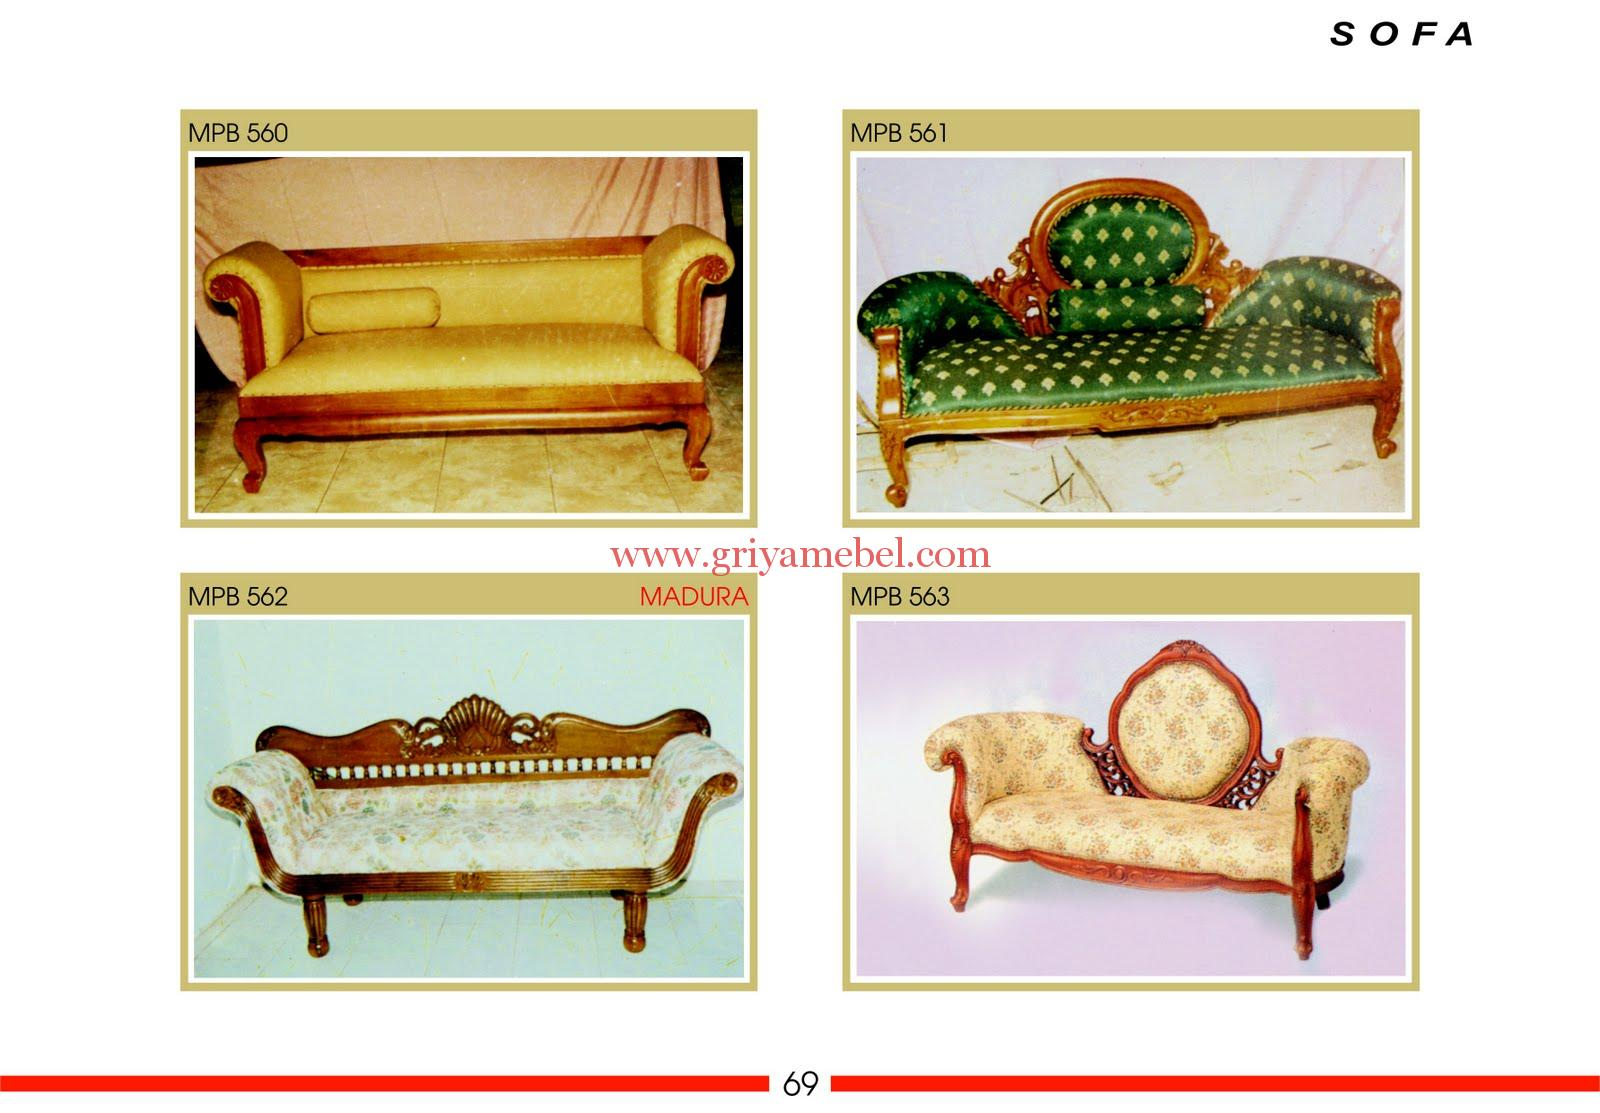 Katalog Bangko Sofa Dan Bale-Bale, sofa lois murah, sofa murah, bangku sofa, bangku murah, bangkusofa ukiran, bangku sofa minimalis, bangko sofa jati, bale-bale murah, bale-bale jati, bale-bale klasik, bale-bale ukiran, model sofa ukiran, sofa terbaru, bangko sofa, furniture jati, furniture murah